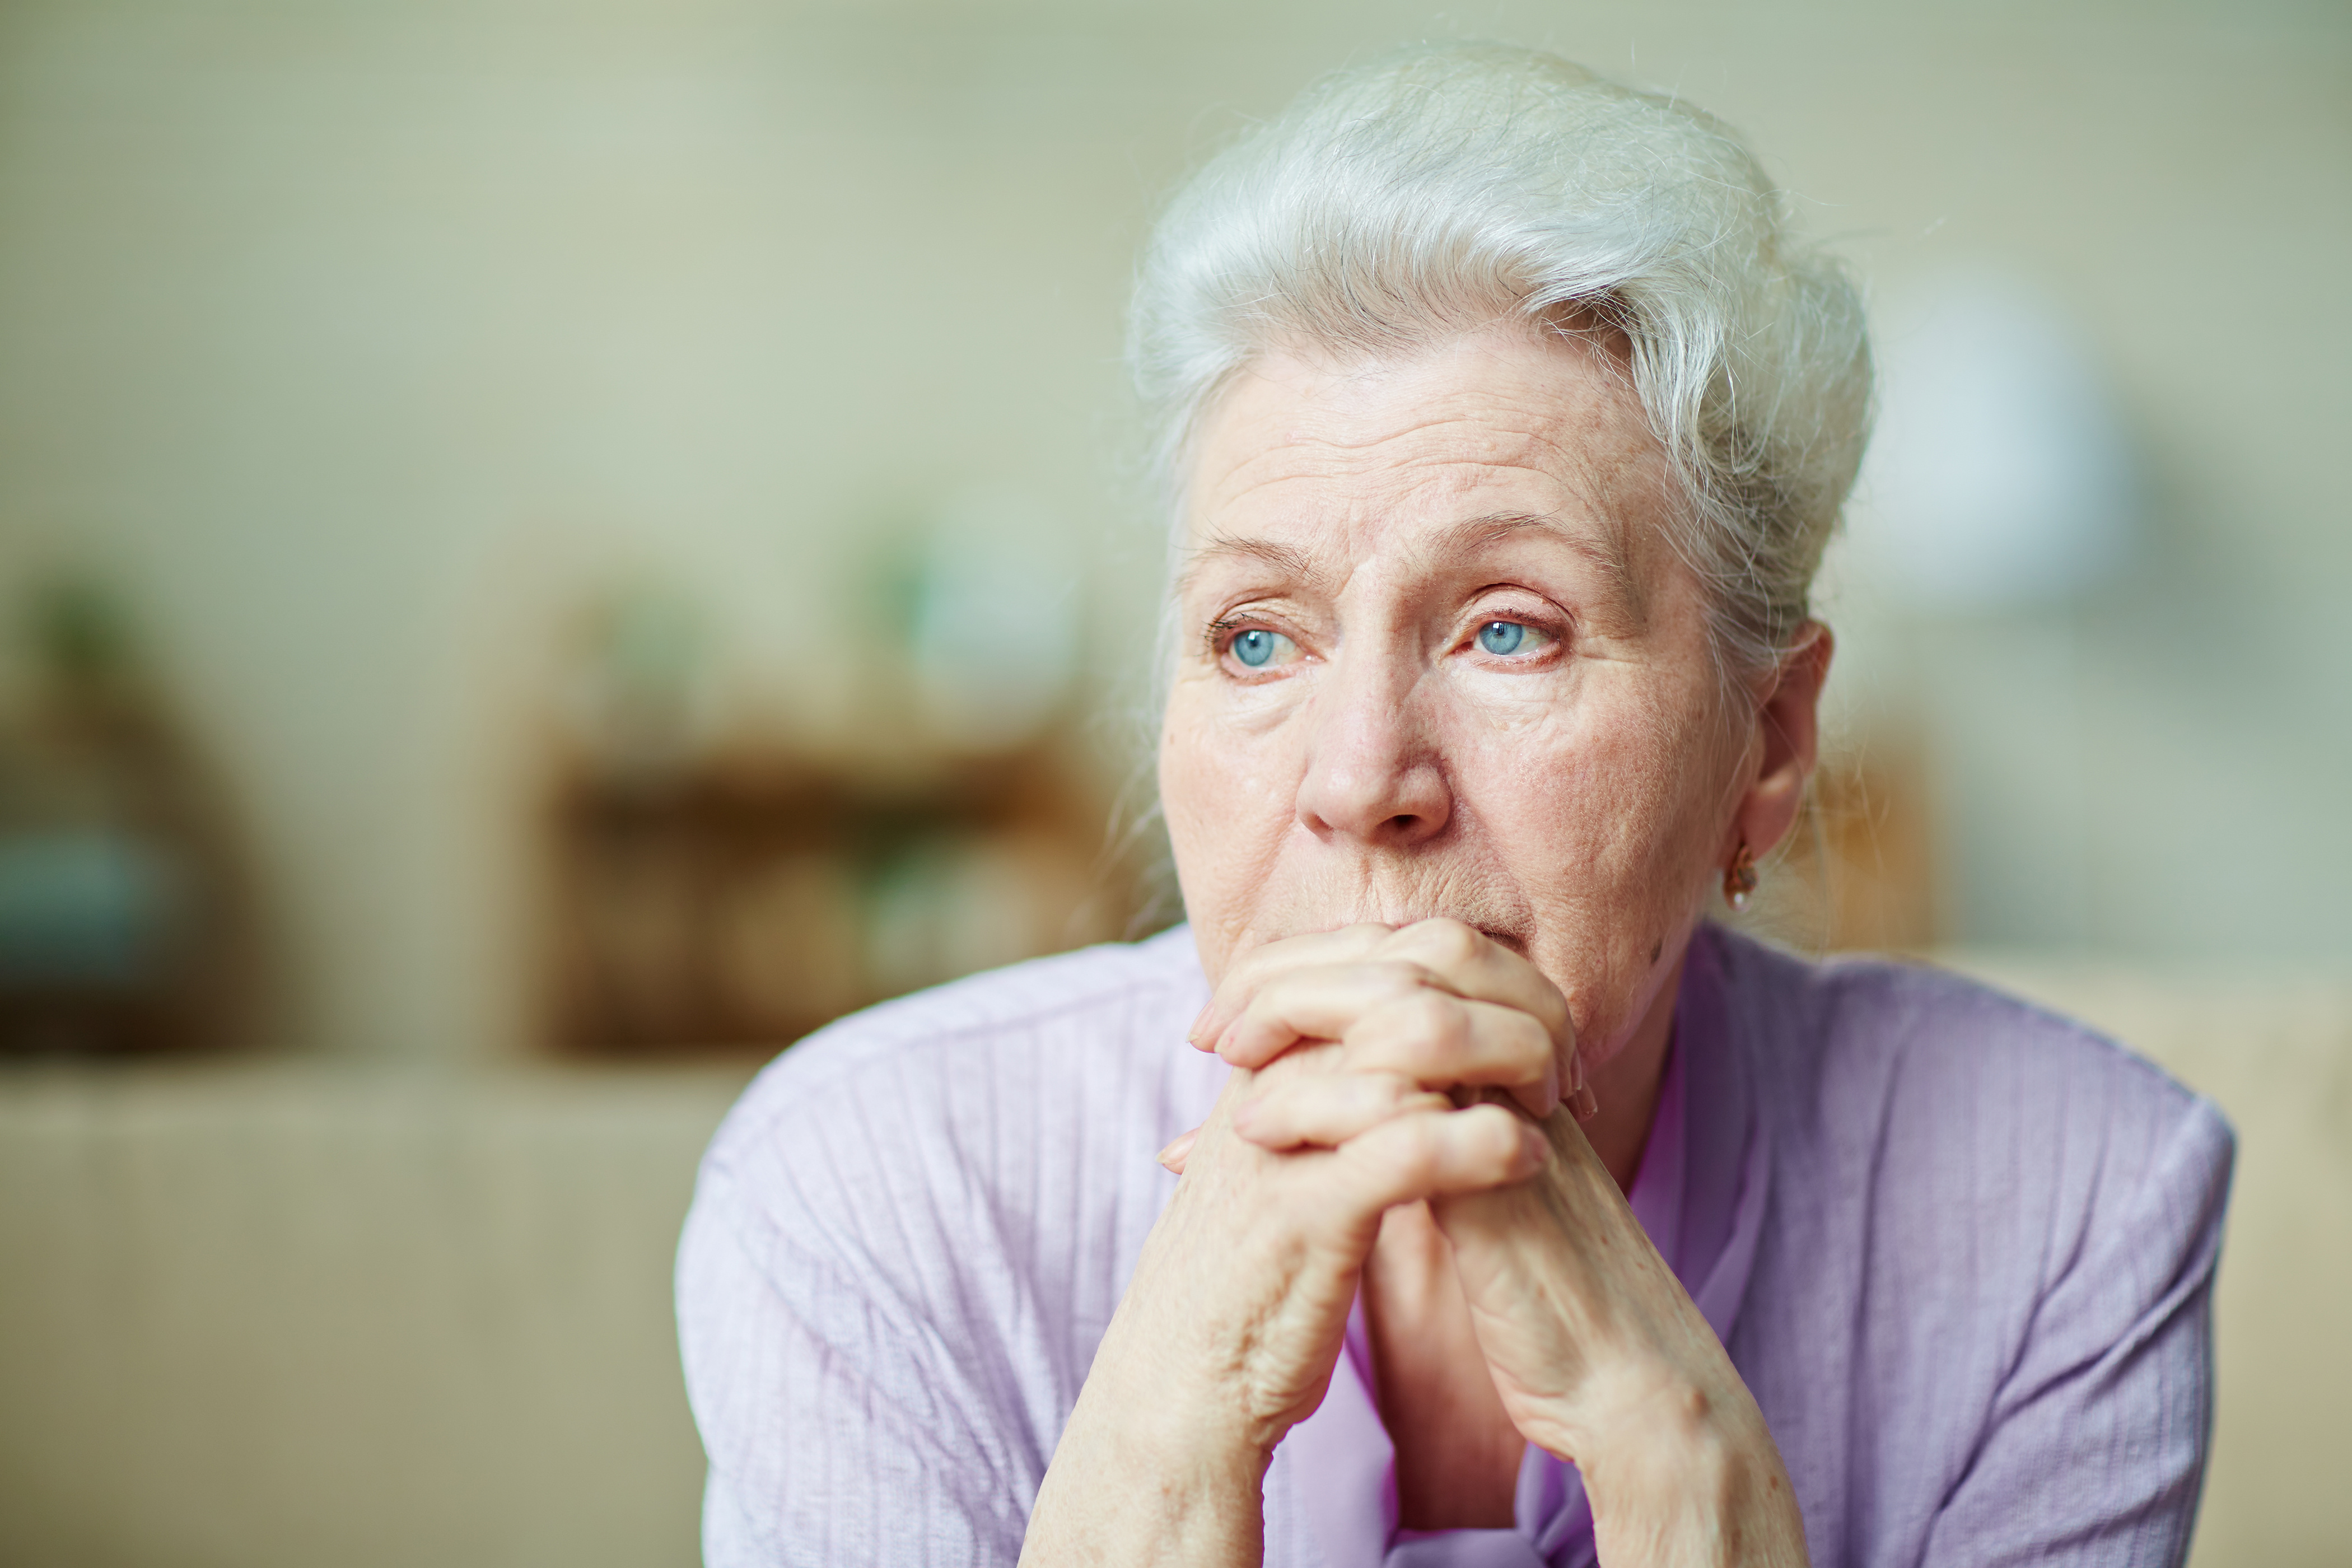 peritoneal cancer how long to live epidemiologie și prevenirea trichocefalelor